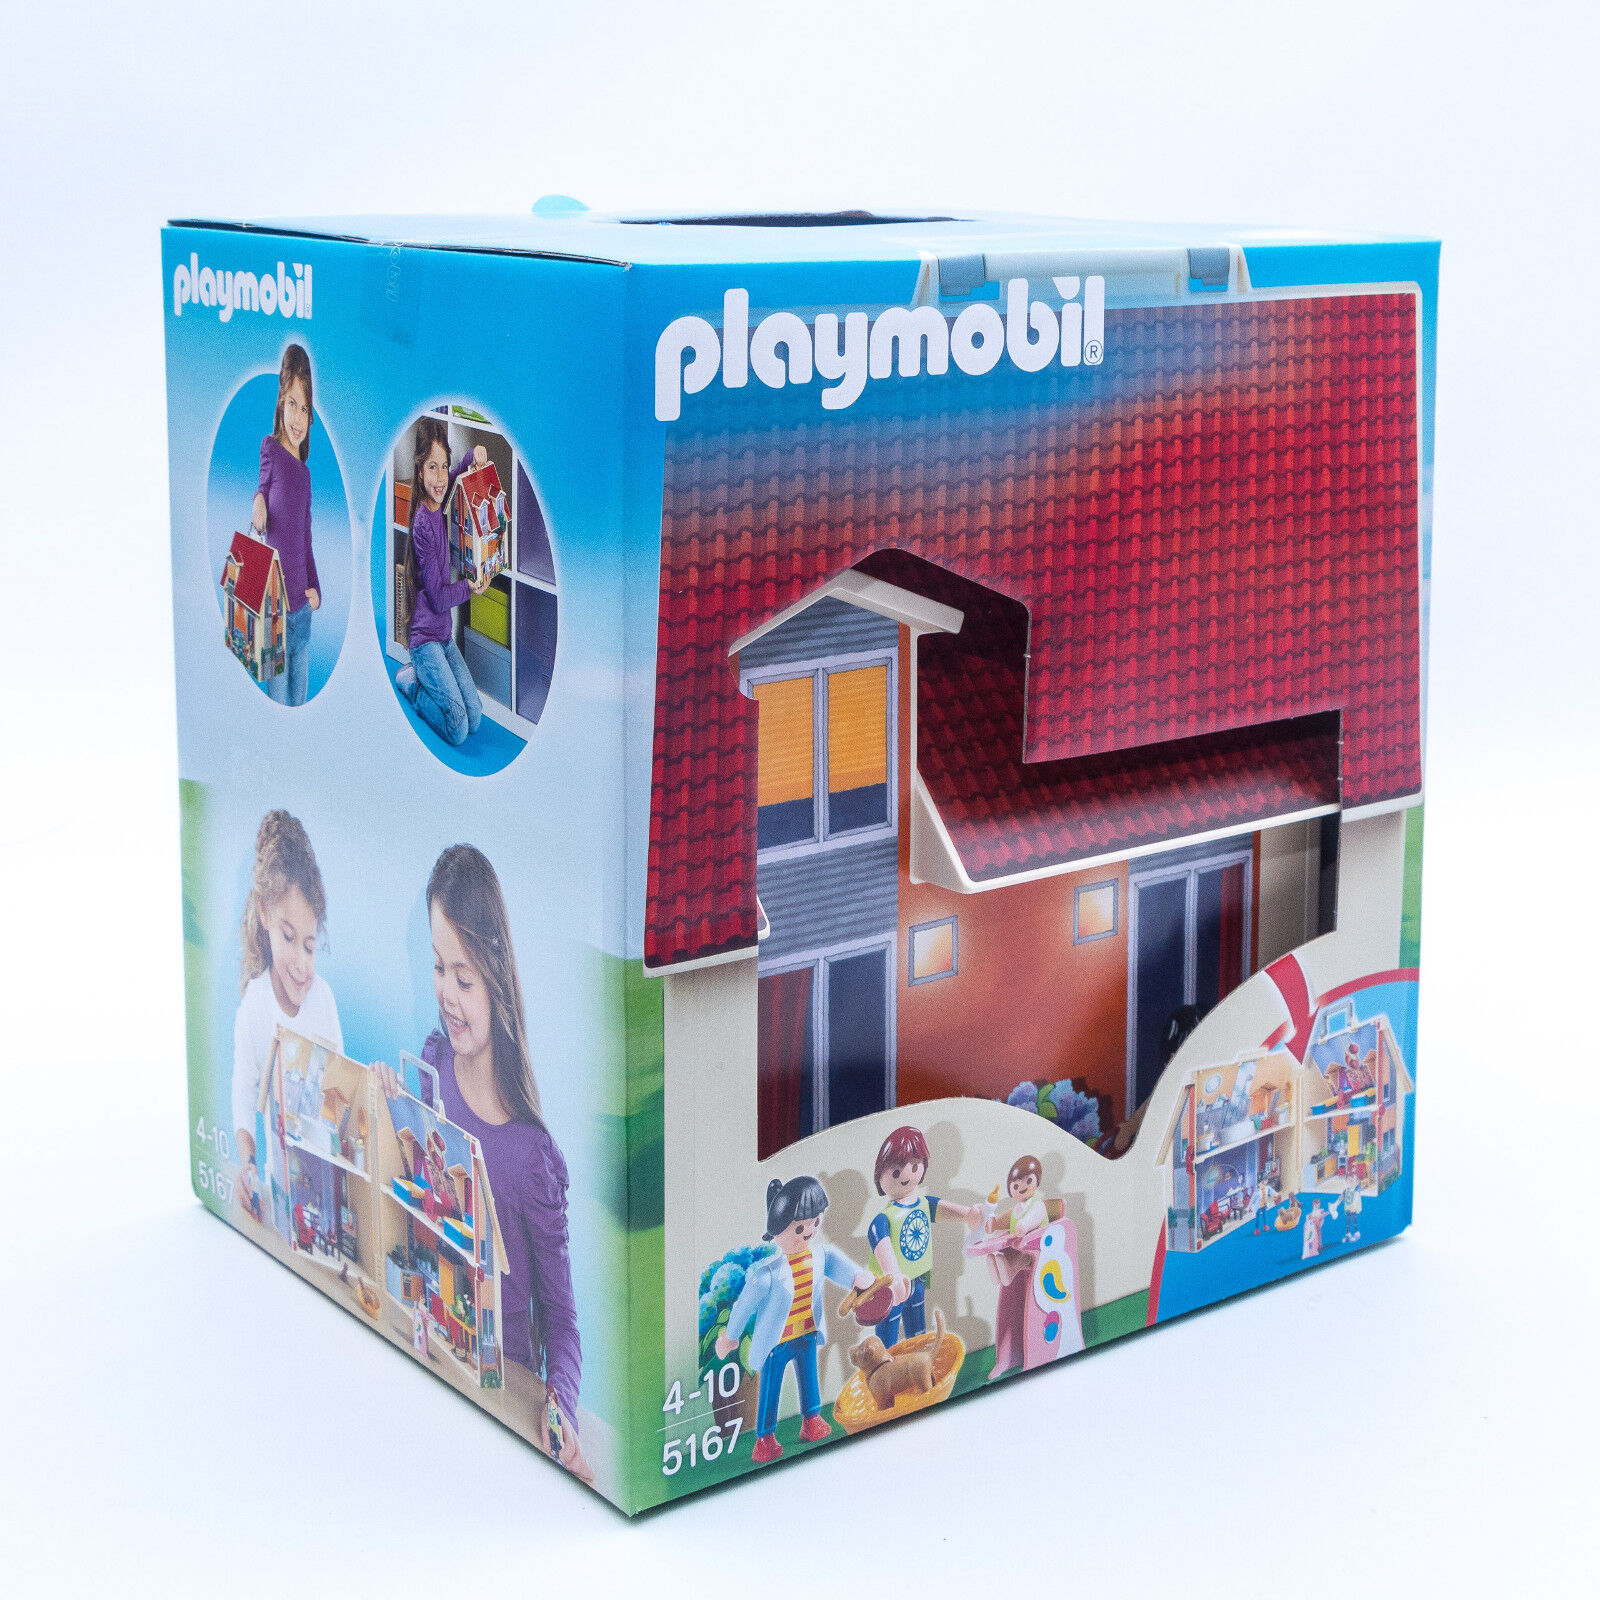 Playmobil 5167 - Mein Neues Mitnehm-Puppenhaus Mitnehm-Puppenhaus Mitnehm-Puppenhaus TV Werbung NEU / OVP f6c7e6